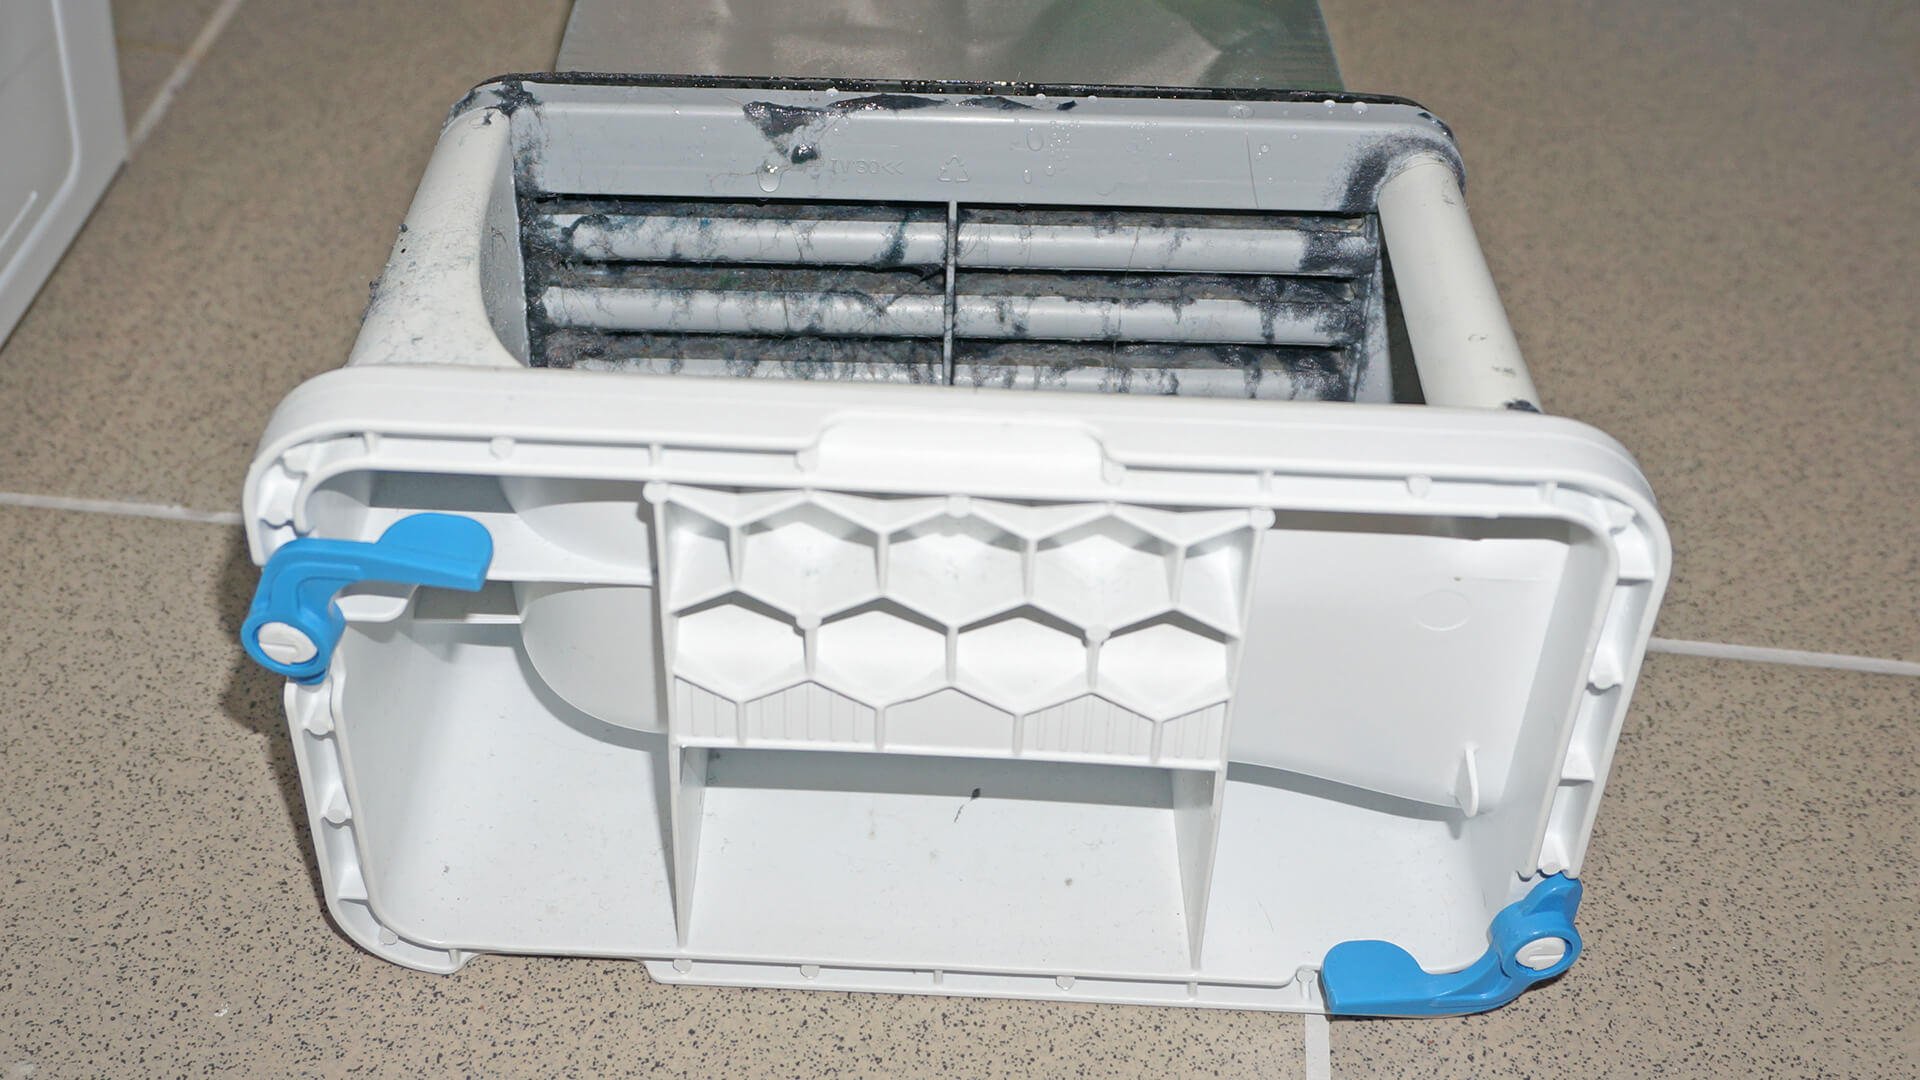 Siemens Kondenstrockner: Fehlermeldung 'Behälter leeren'